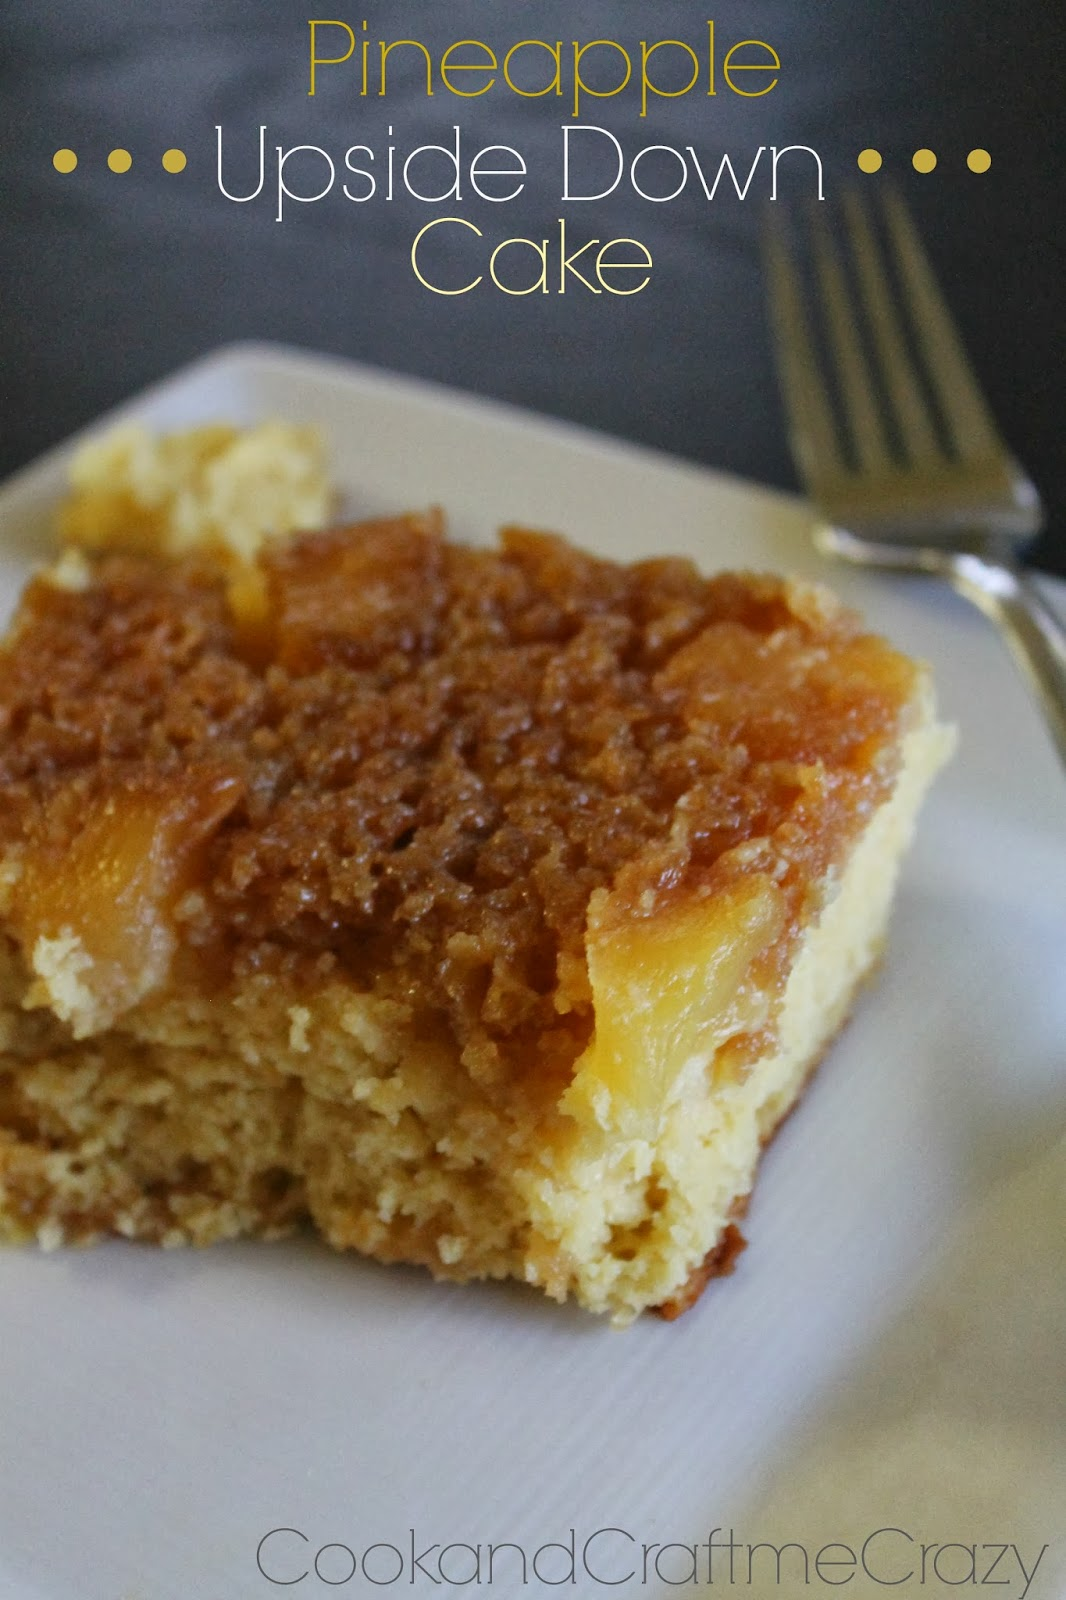 Pineapple Tidbits Or Chunks In Pinepple Upside Down Cake